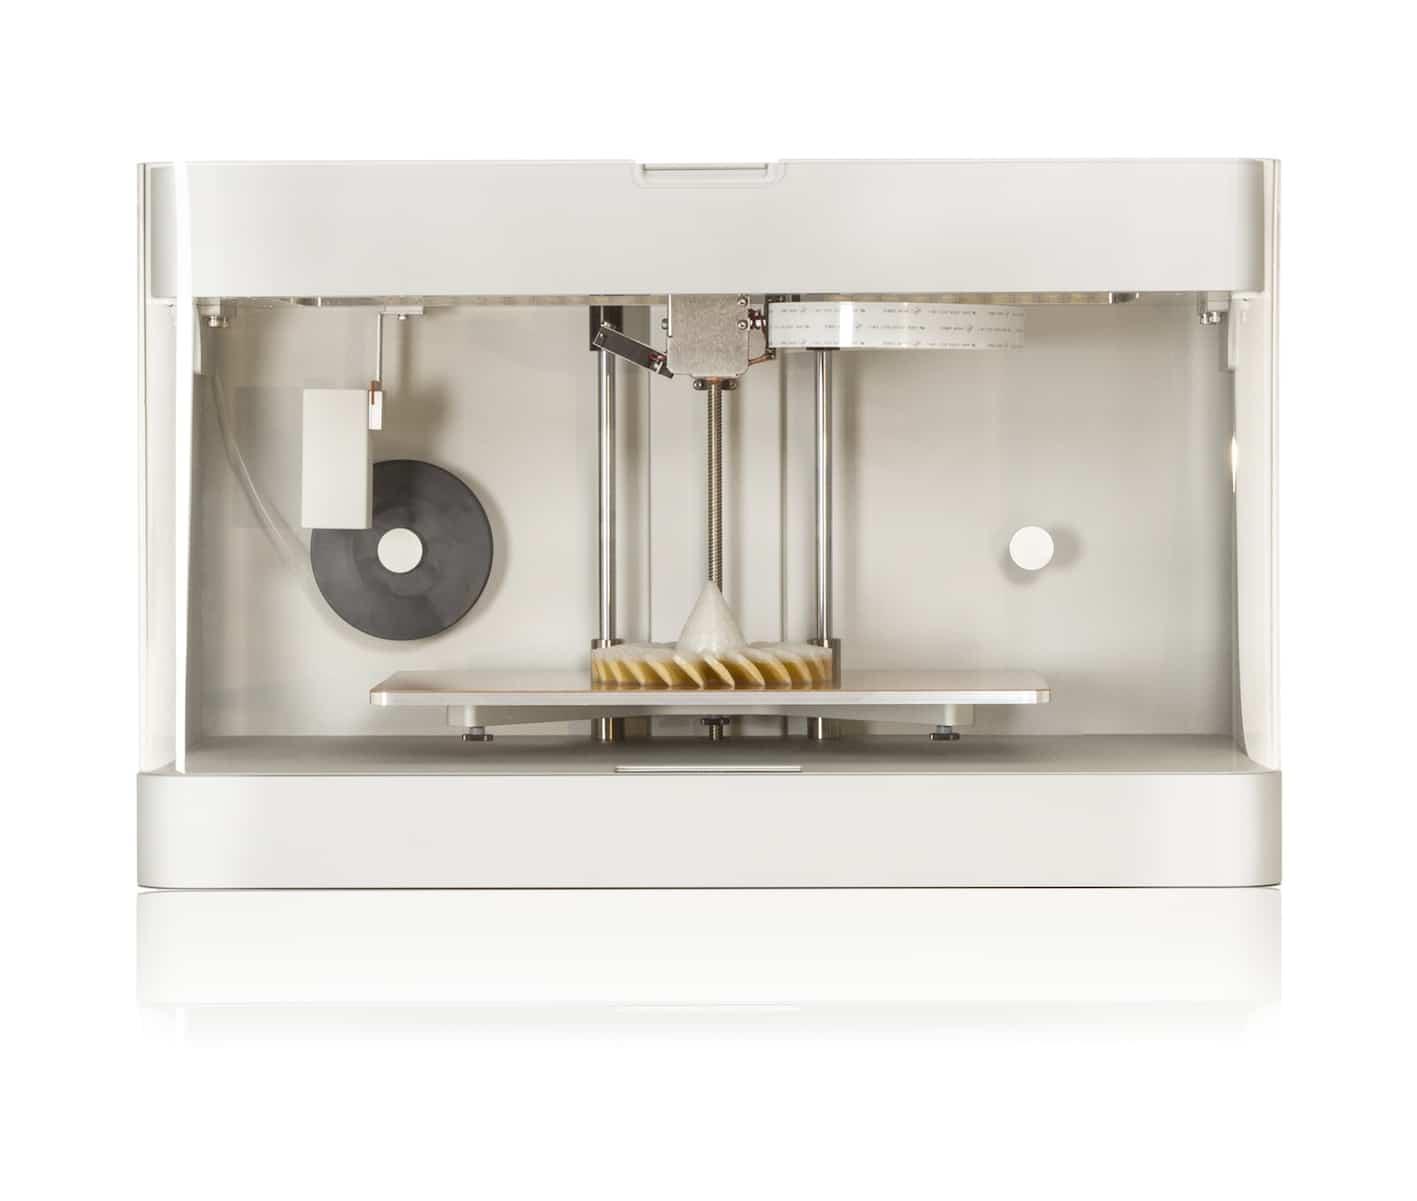 Mark One - מדפסת תלת מימד המסוגלת להדפיס בסיב פחמן, החזק פי 20 מפלסטיק ABS ופי חמש מאלומיניום